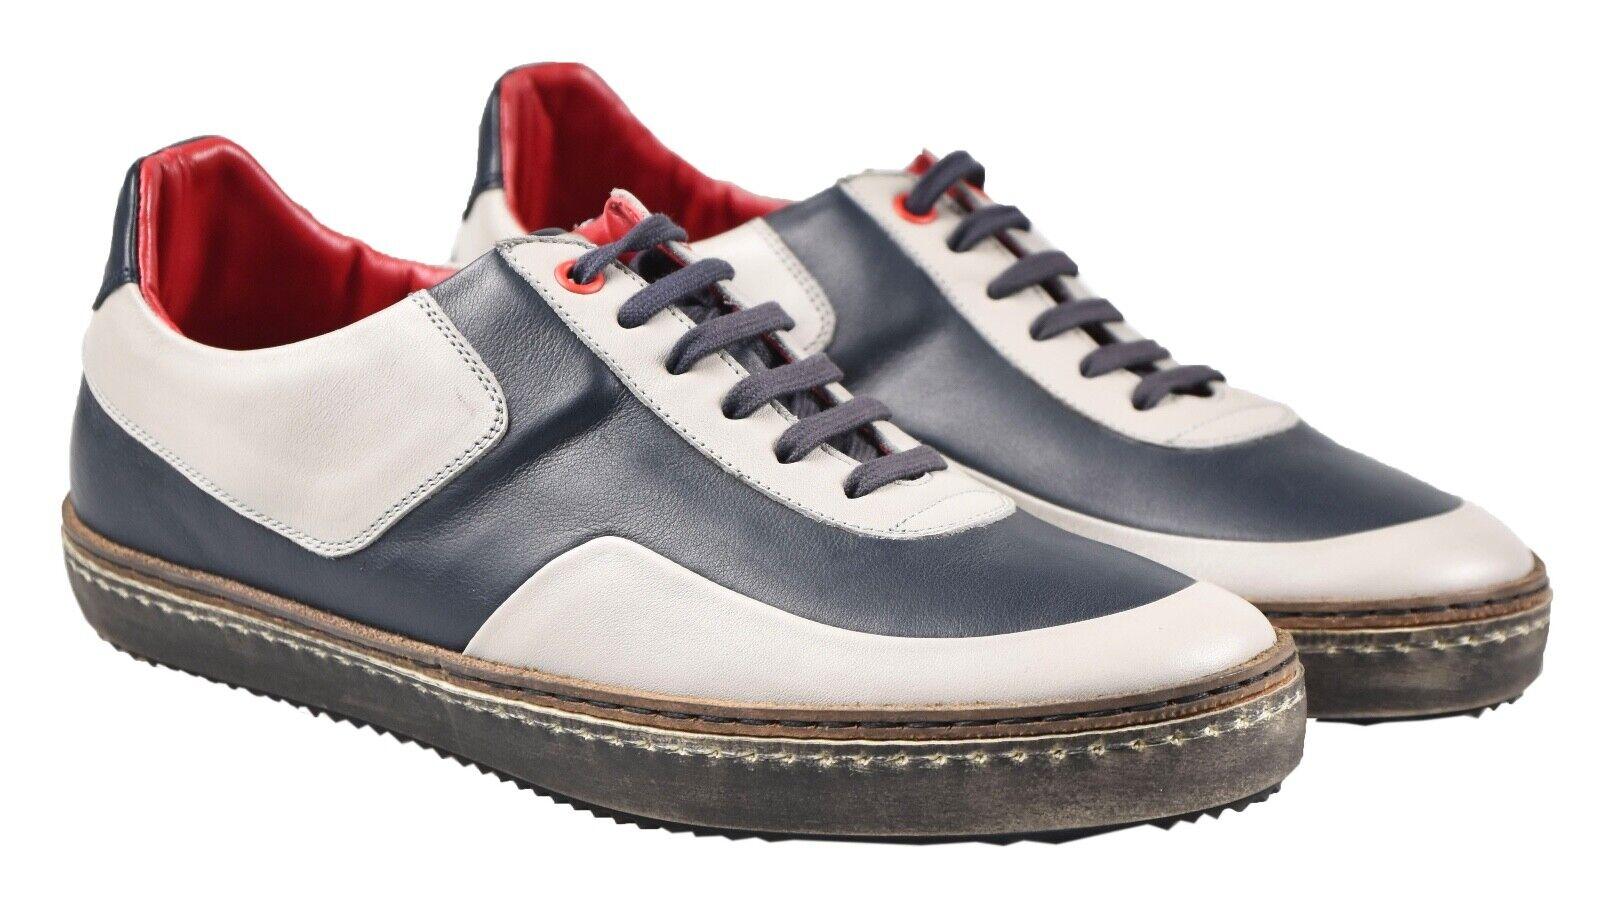 NEW KITON scarpe da ginnastica scarpe 100% LEATHER SZ 8 US 41 EU 19O140